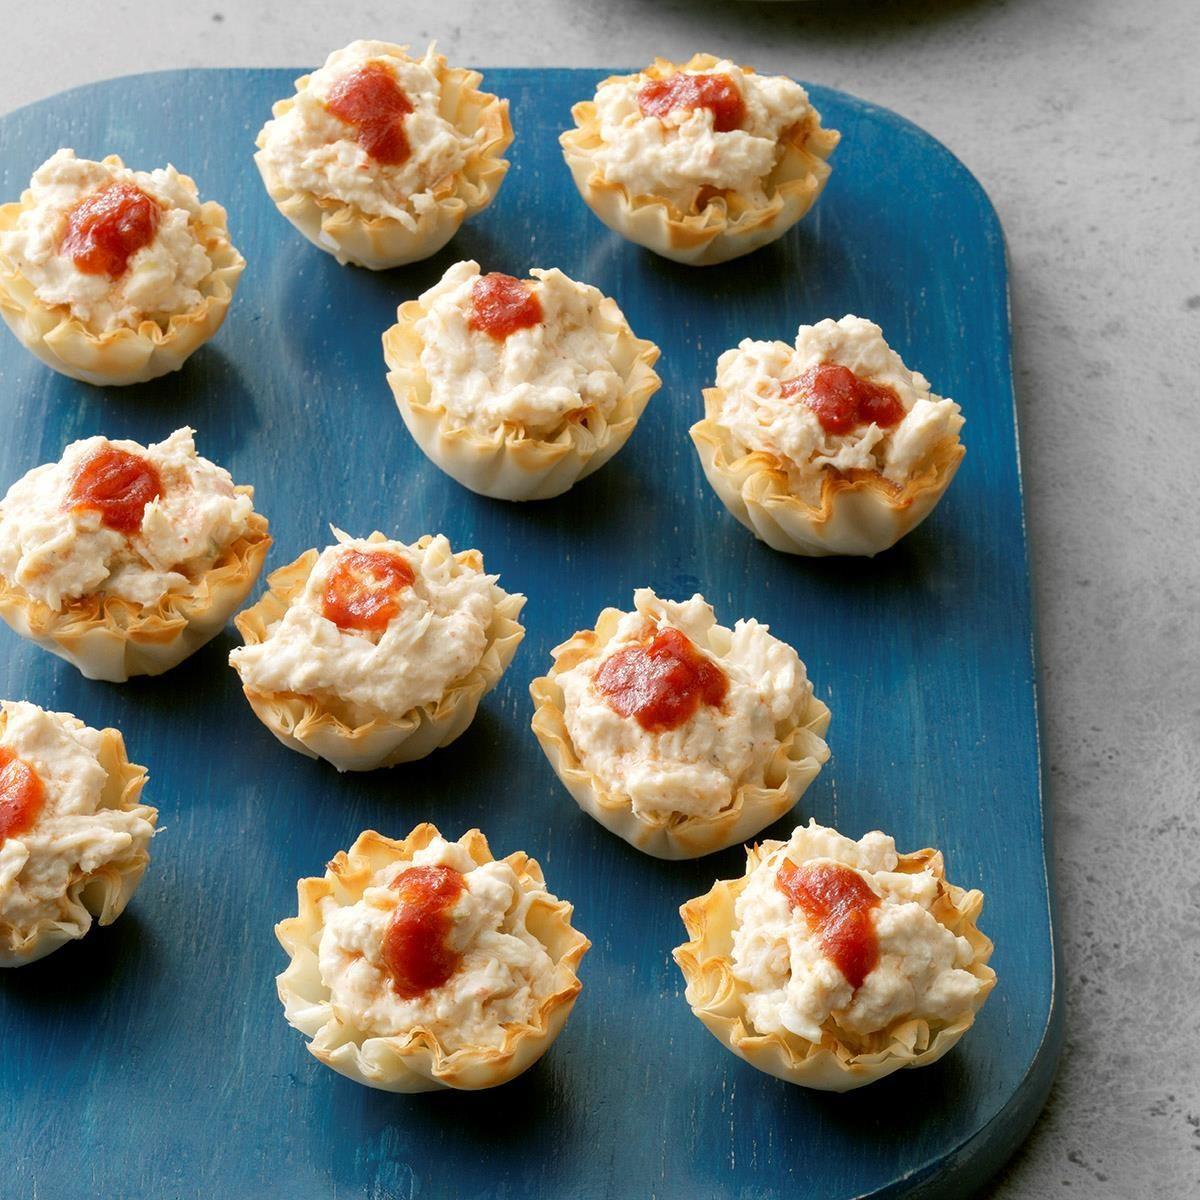 Homemade Wedding Reception Food: Crab Phyllo Cups Recipe